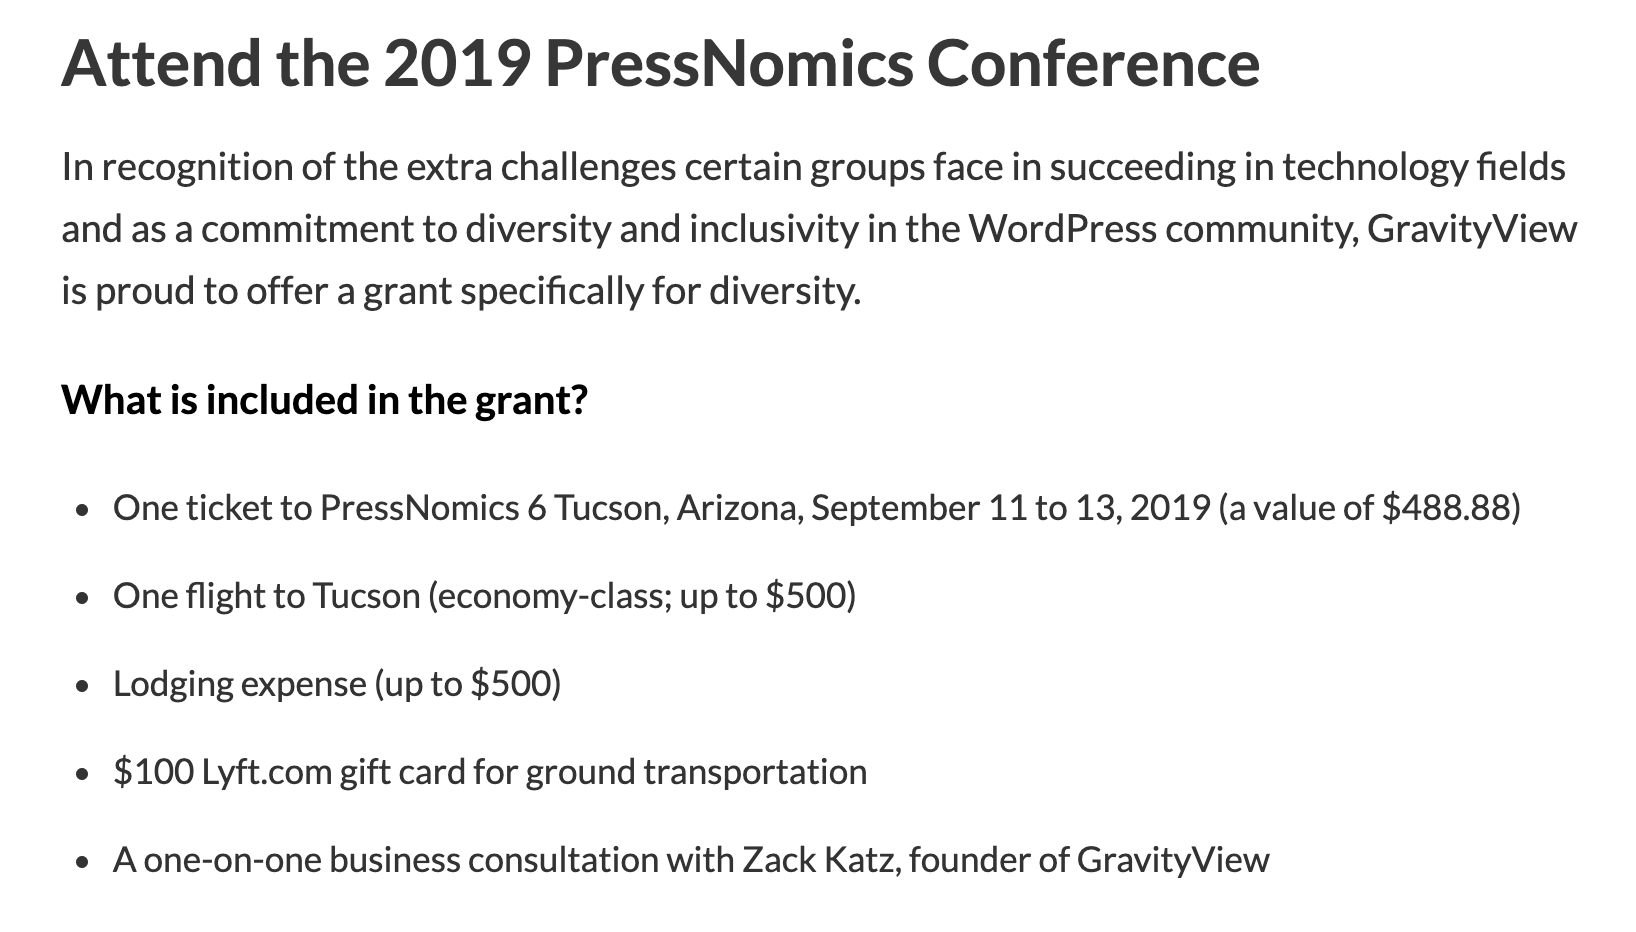 gravityviews diversity grant